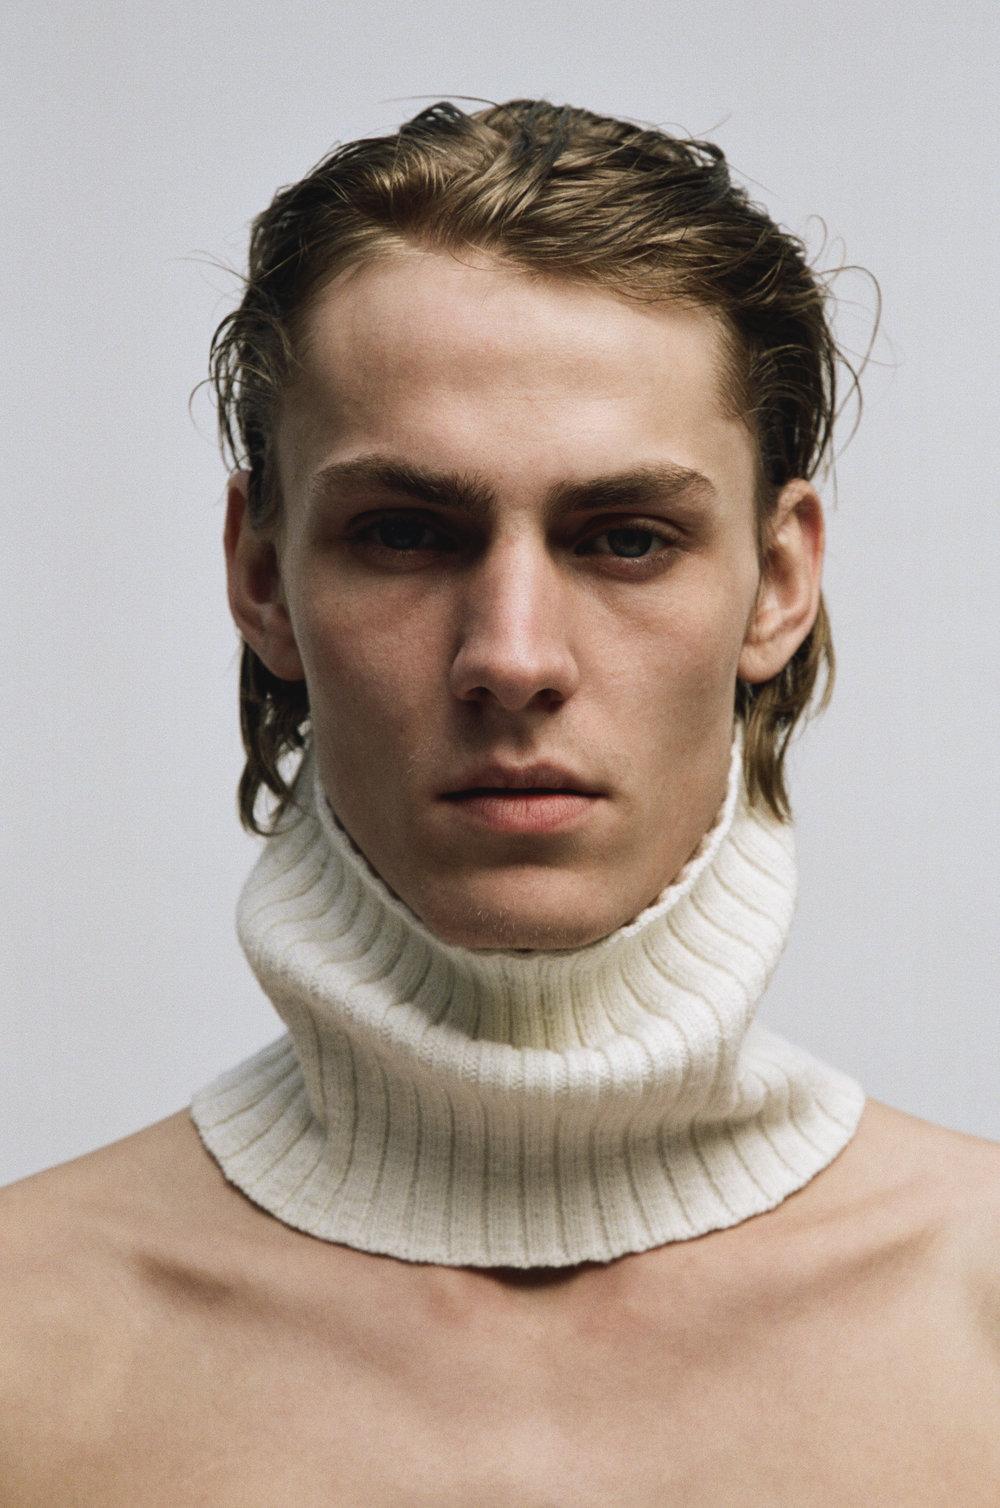 Fabien-Kruszelnicki-Ludovic-de-Saint-Sernin-Ansinth_Page_04_Image_0003.jpg